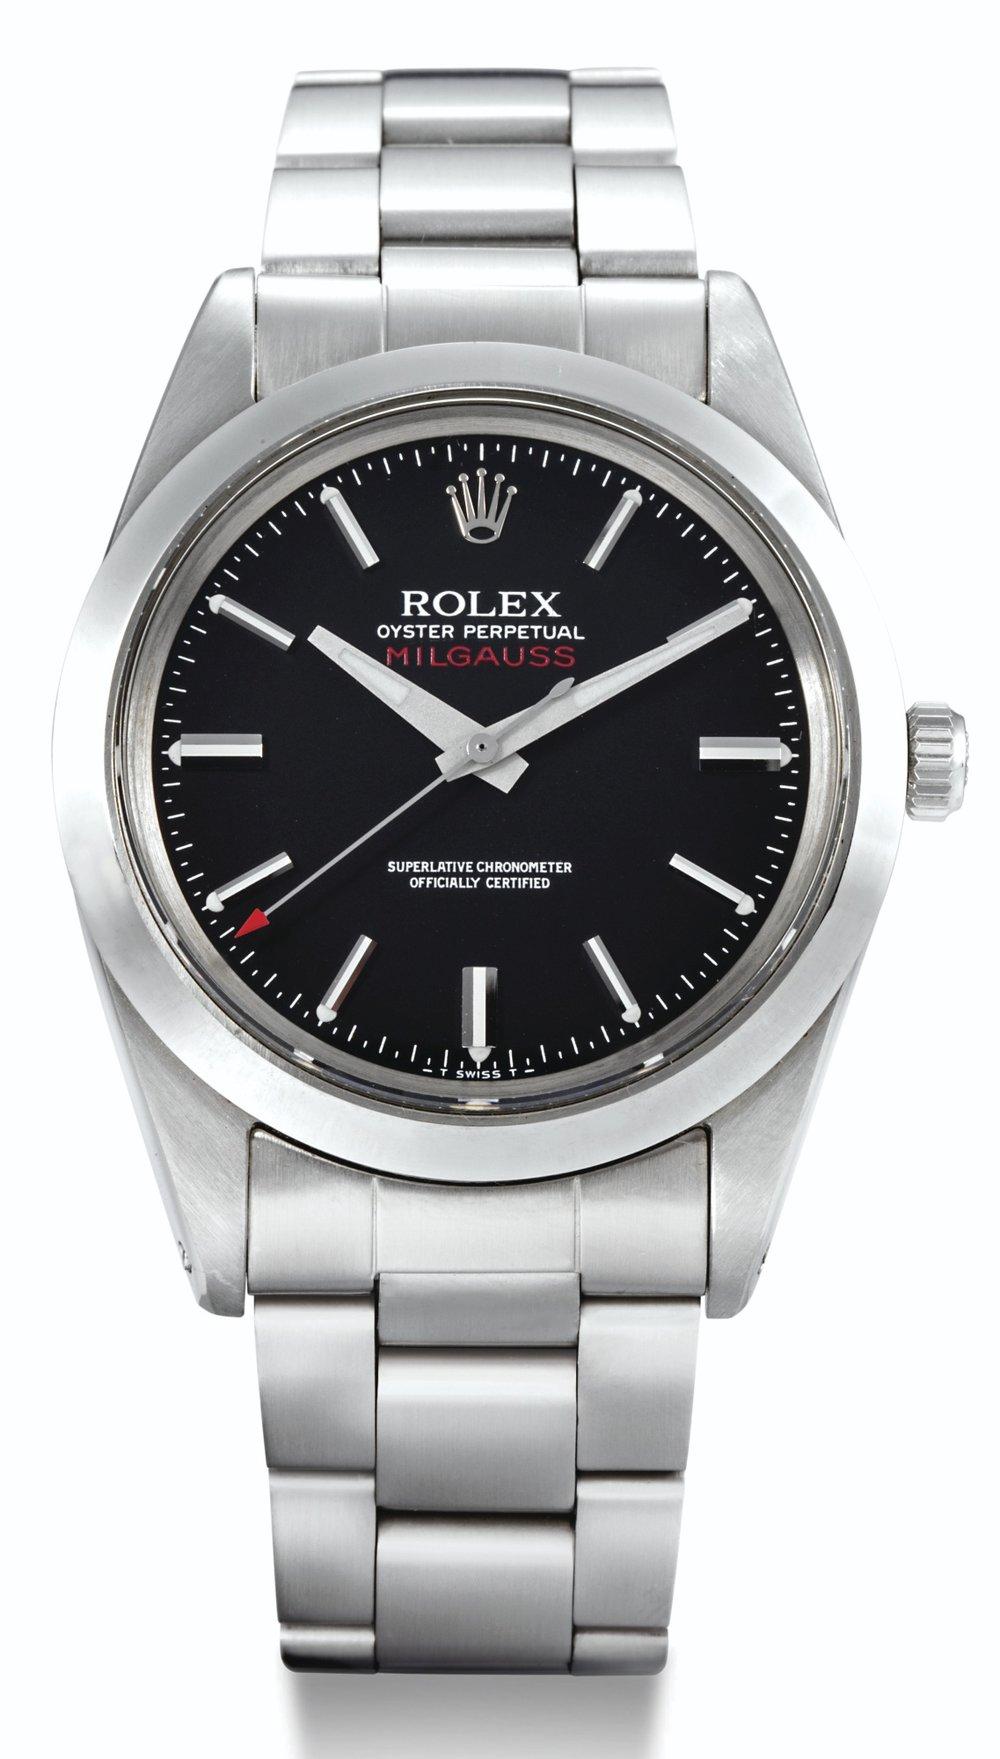 Rolex Milgauss Ref 6019, circa 1965